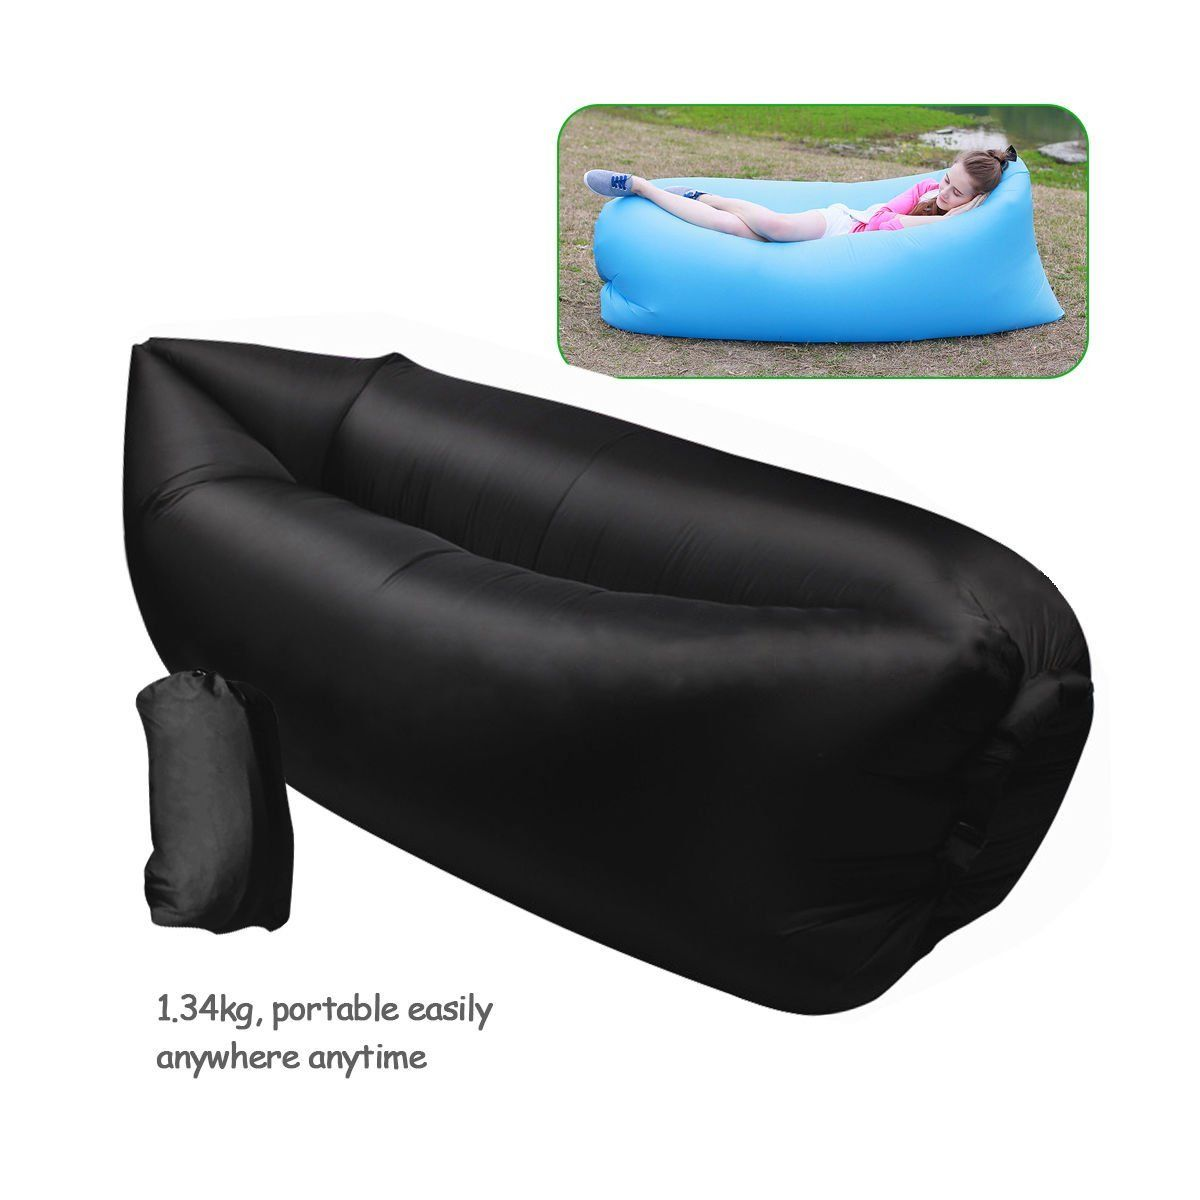 Inflatable Outdoor Air Sleep Sofa Couch Portable Furniture Sleeping Hangout  Lounger Imitate Nylon External Internal PVC